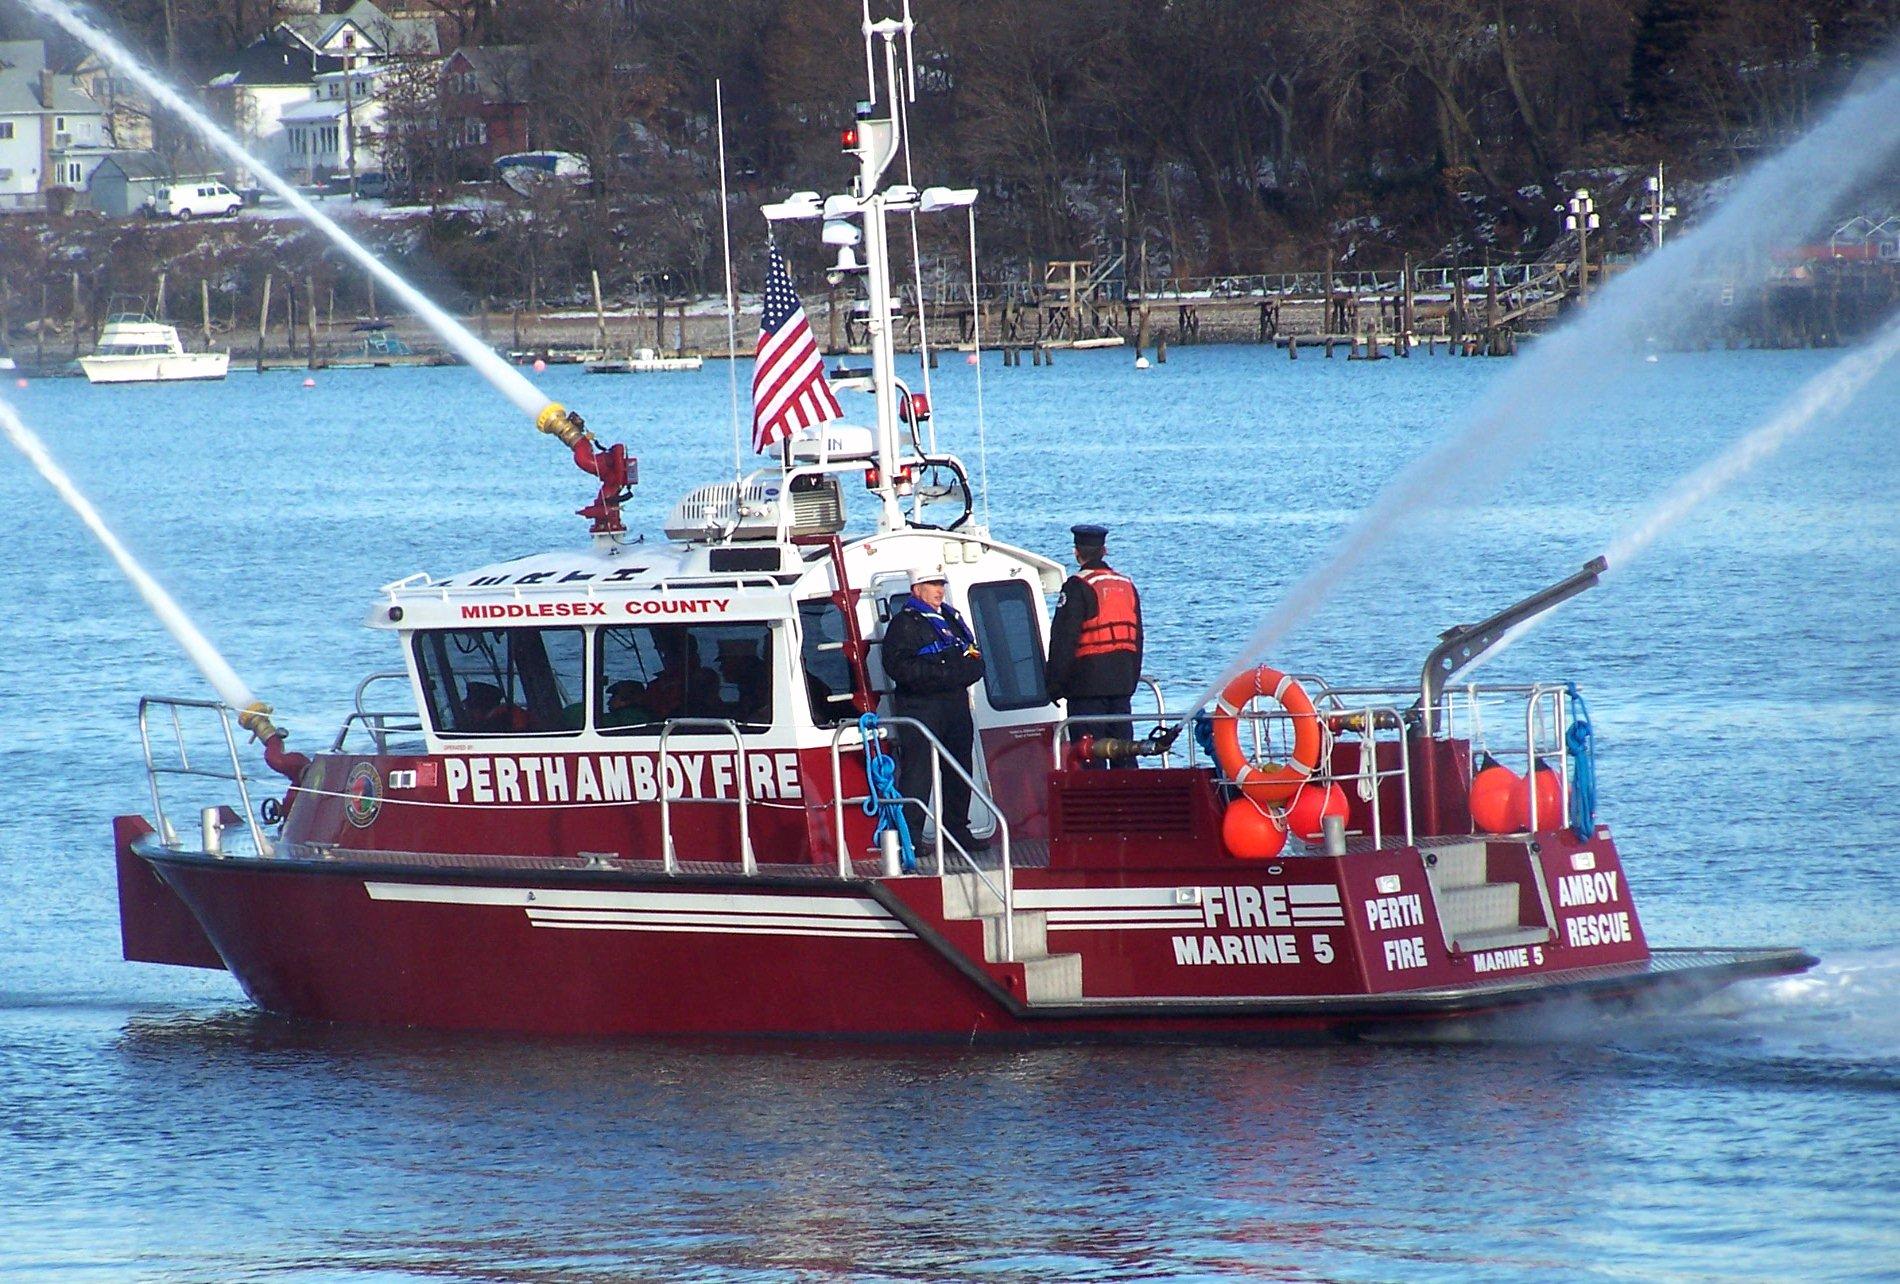 Marine 5 - Fireboat